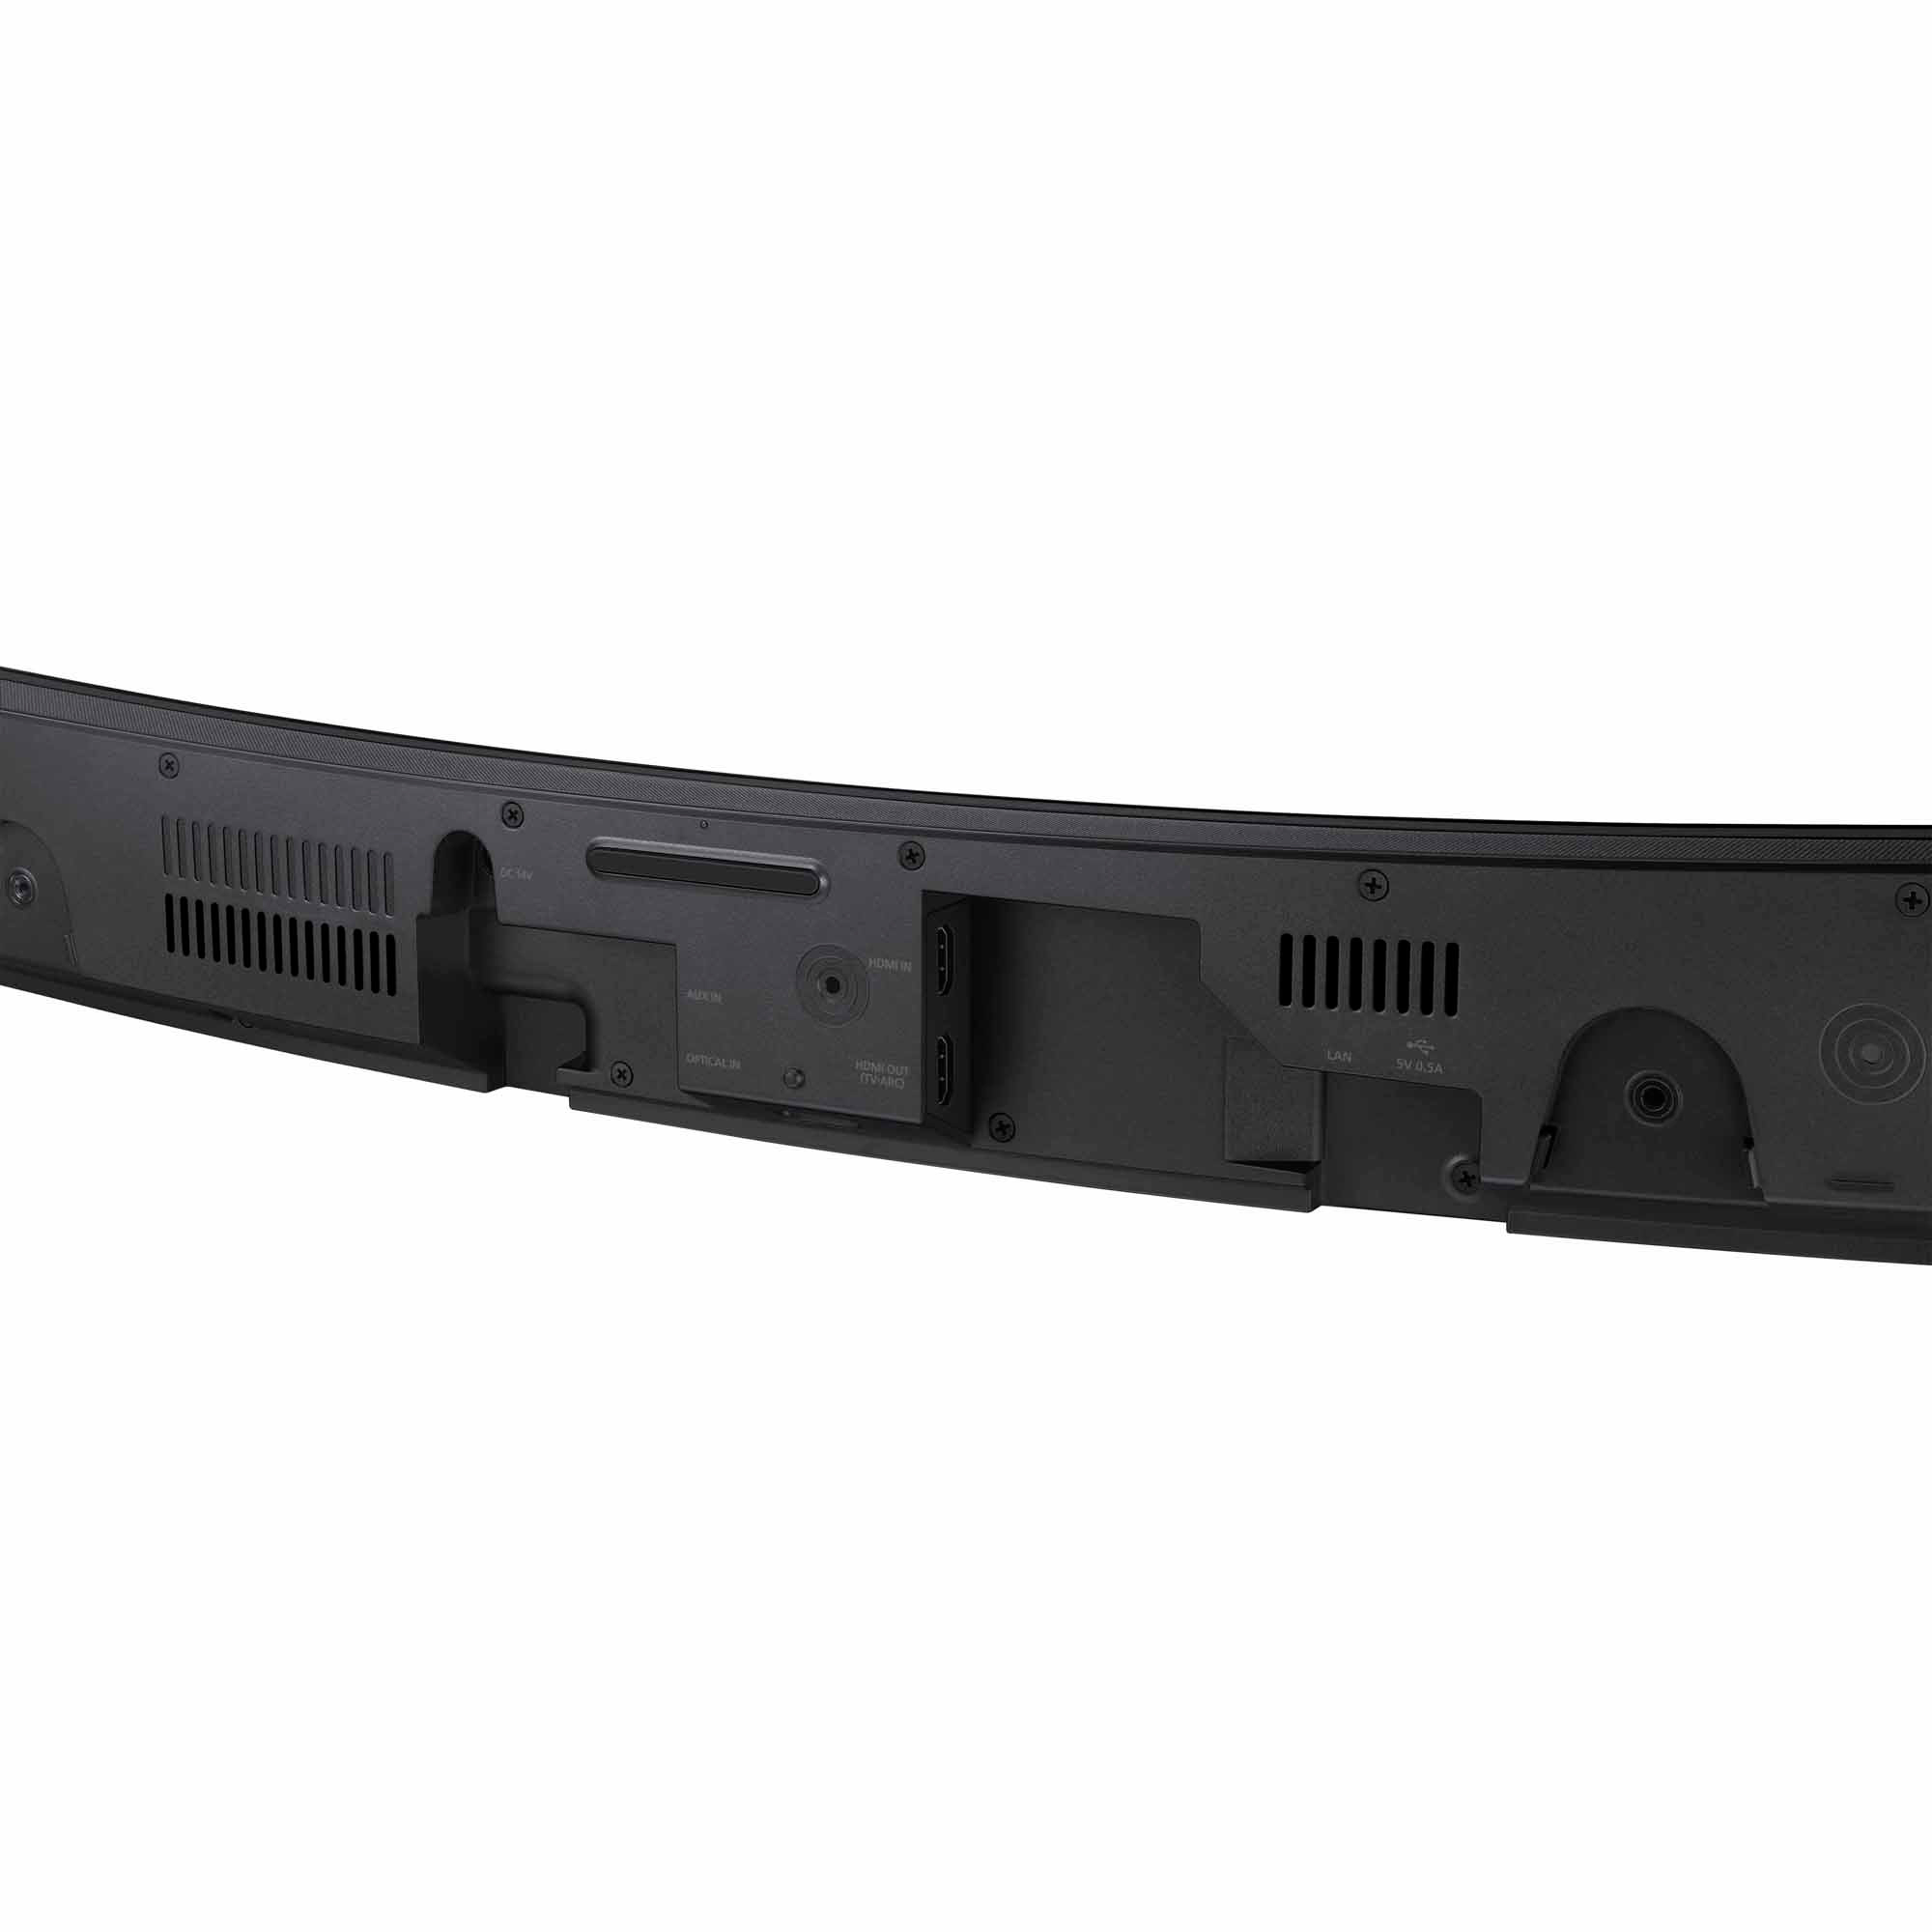 Samsung 6.1-Channel 300W Curved Soundbar w/ Wireless Subwoofer - HW-J6000